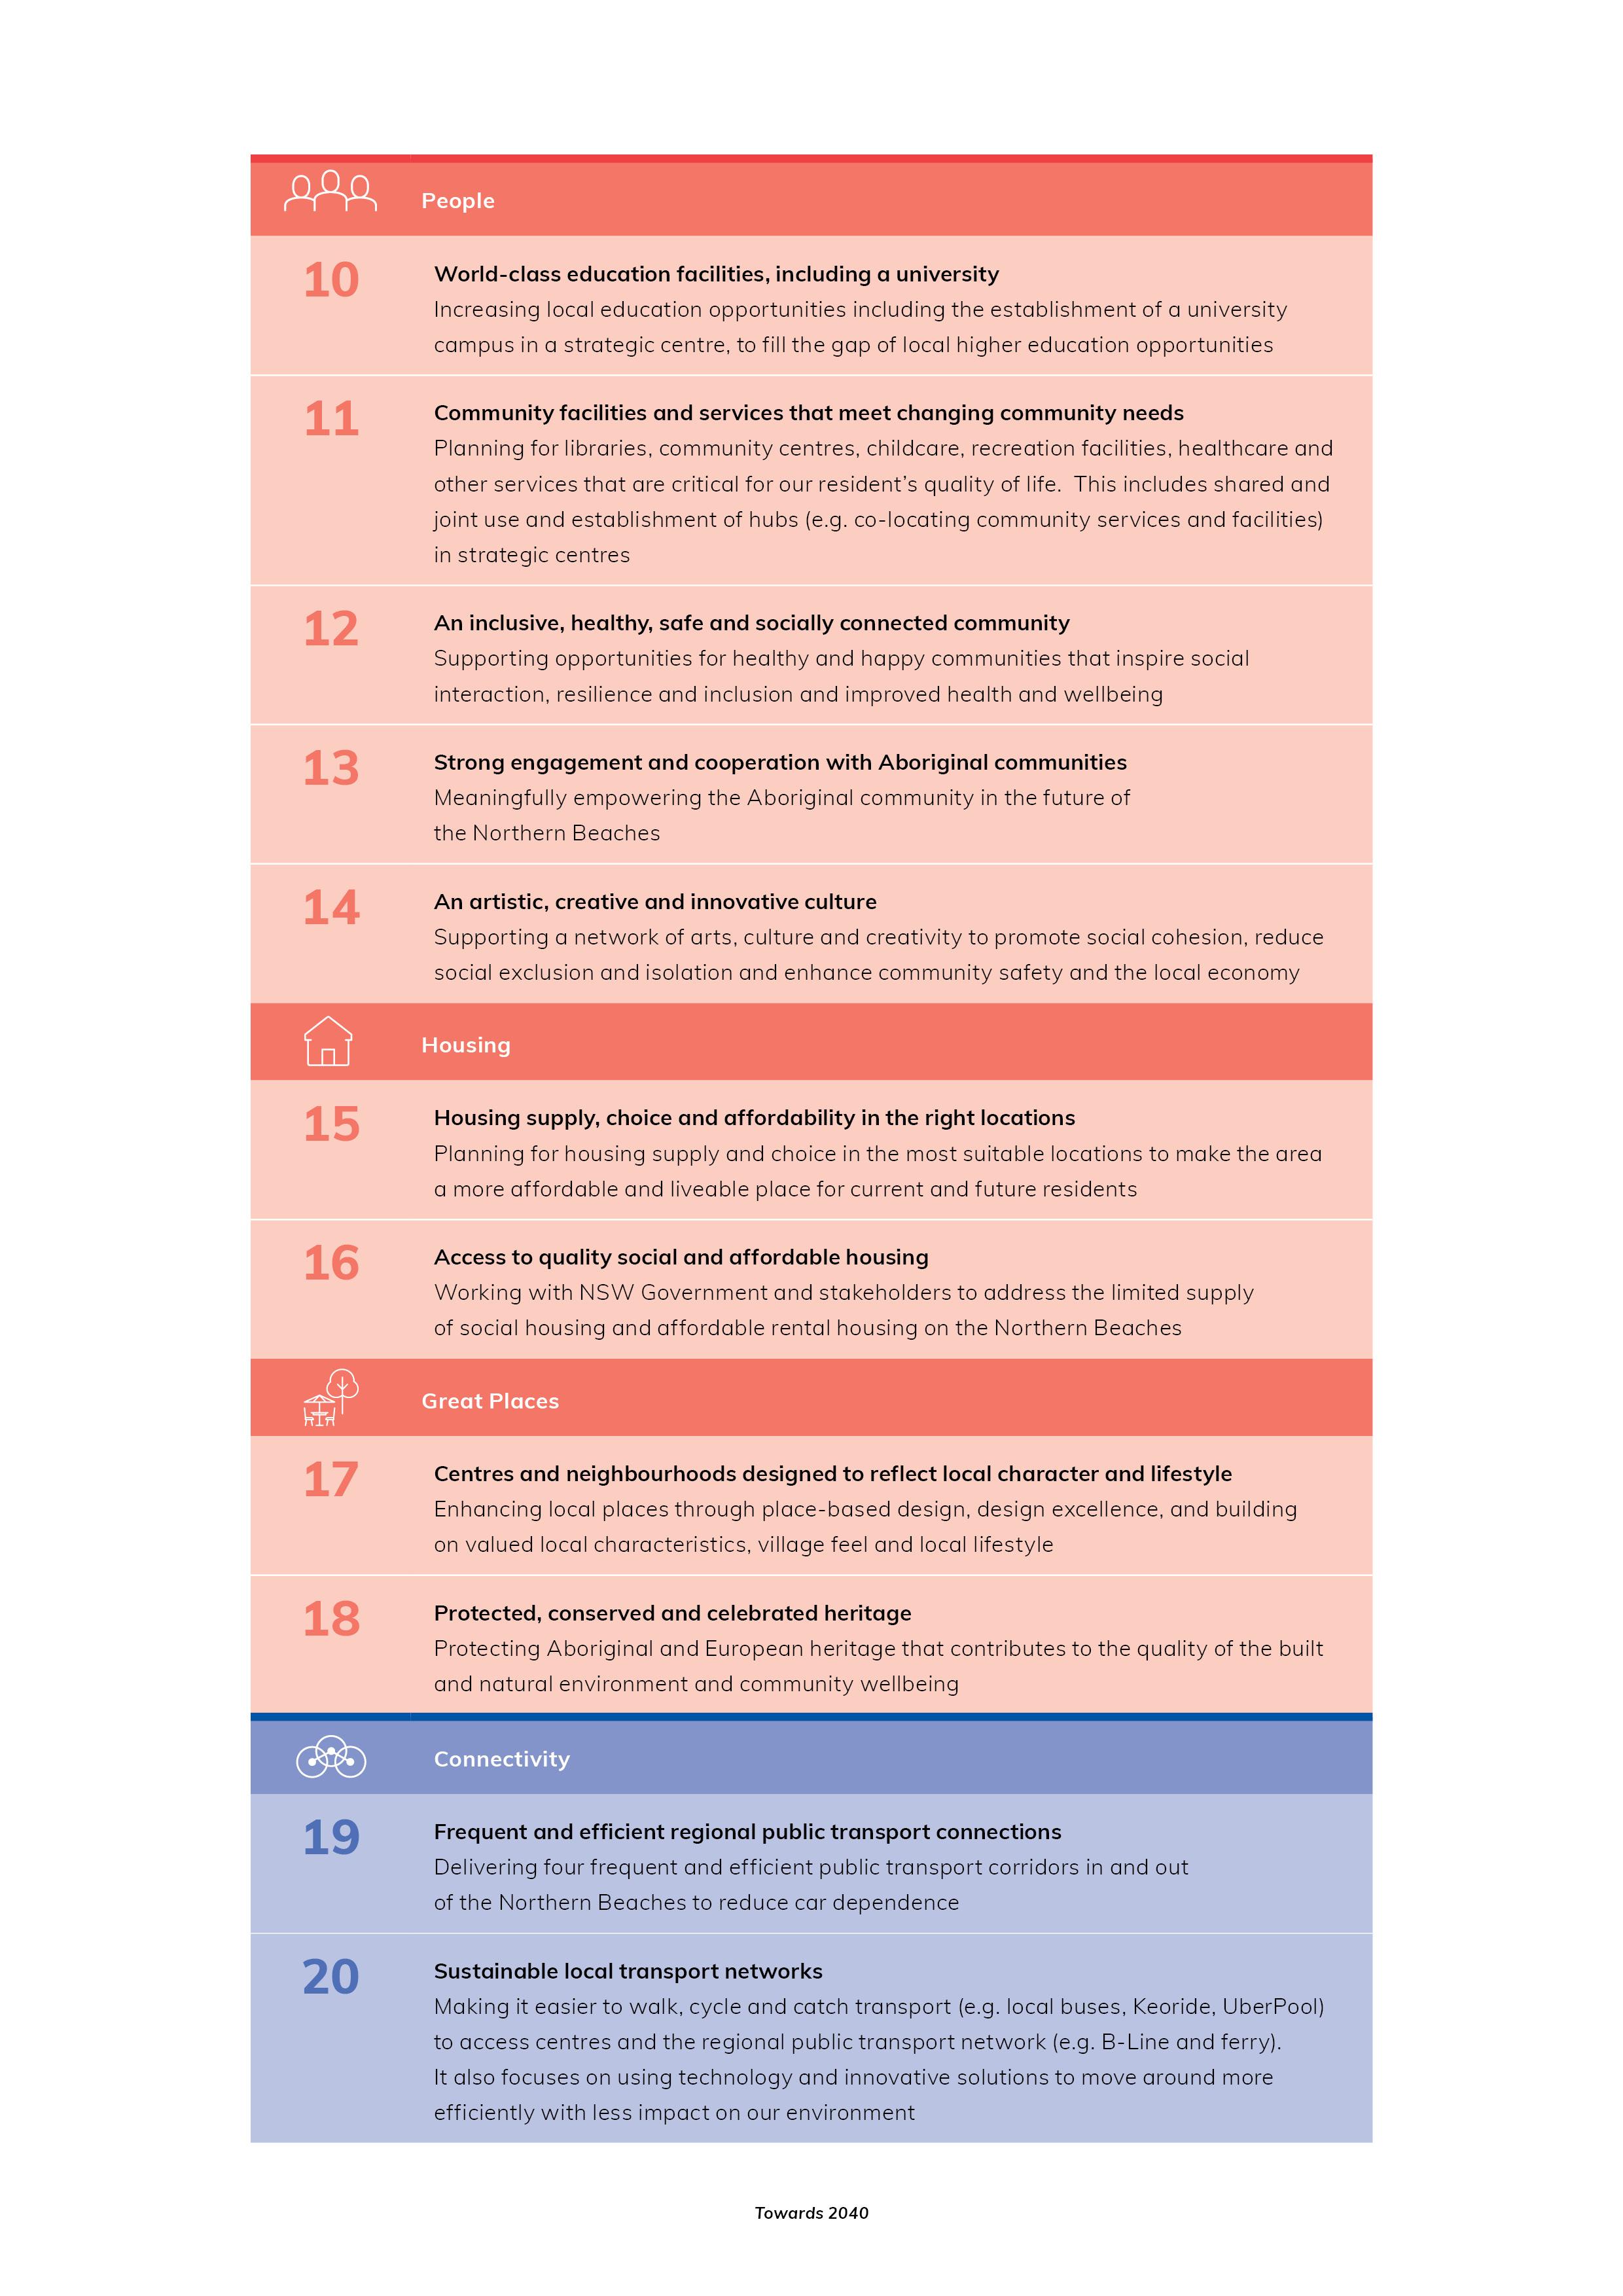 Draft priorities page 2 of 3